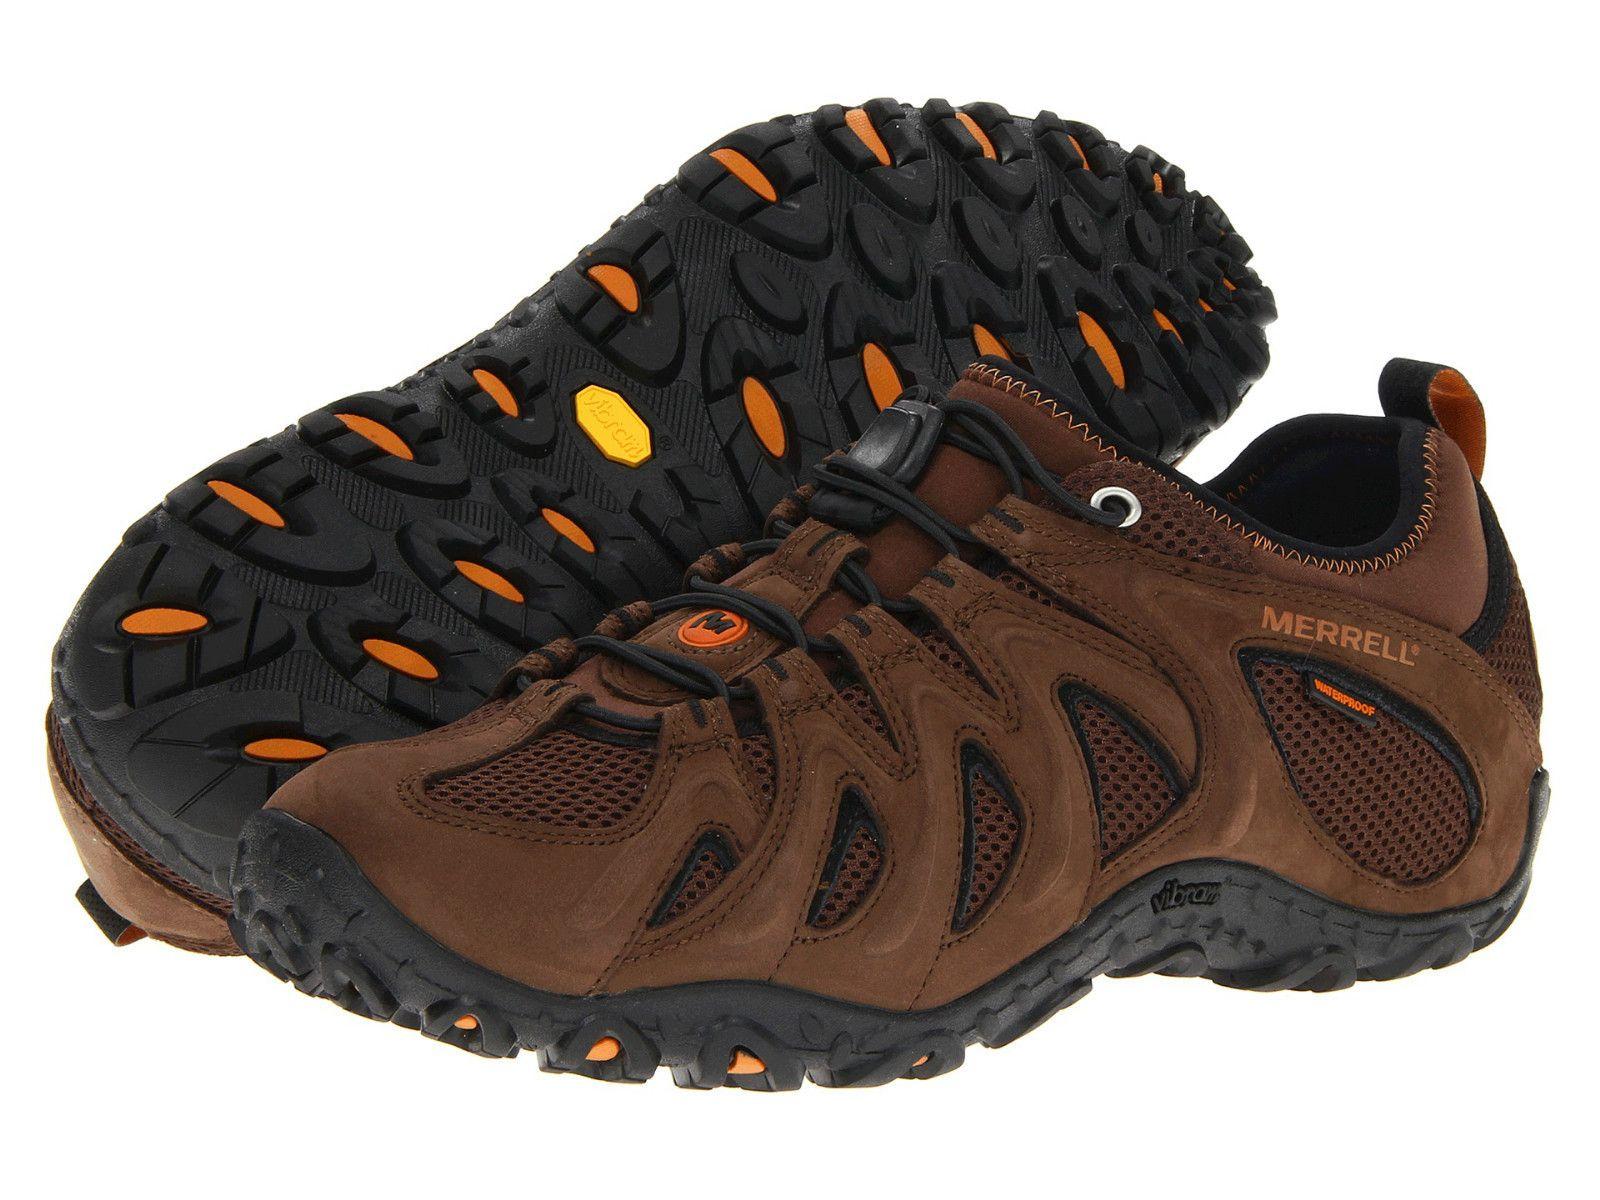 cf53e9b1cf1 Merrell Chameleon 4 Stretch Waterproof Boulder Black Slate Boot J39911